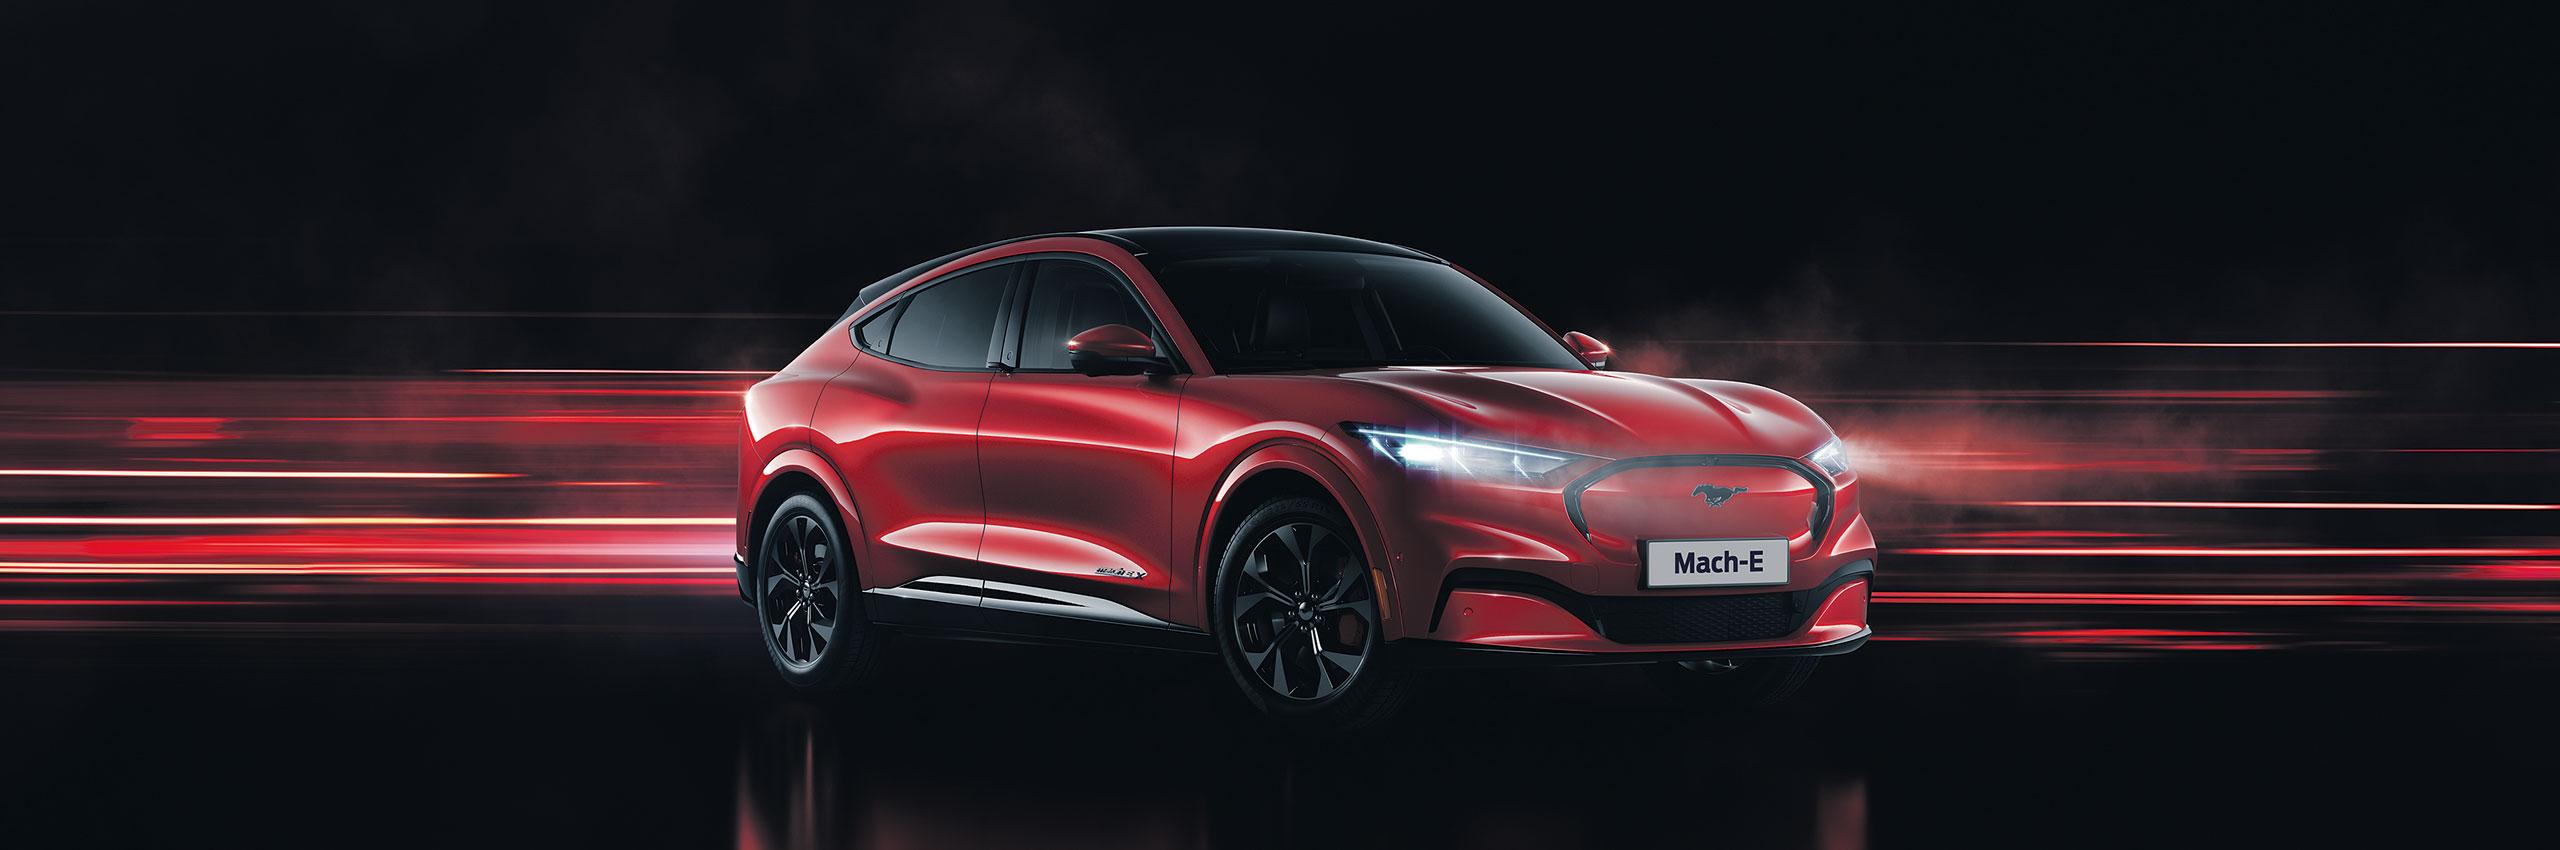 mustang-mach-e-2021-levorannan-auto-levoranta-autoliike-2